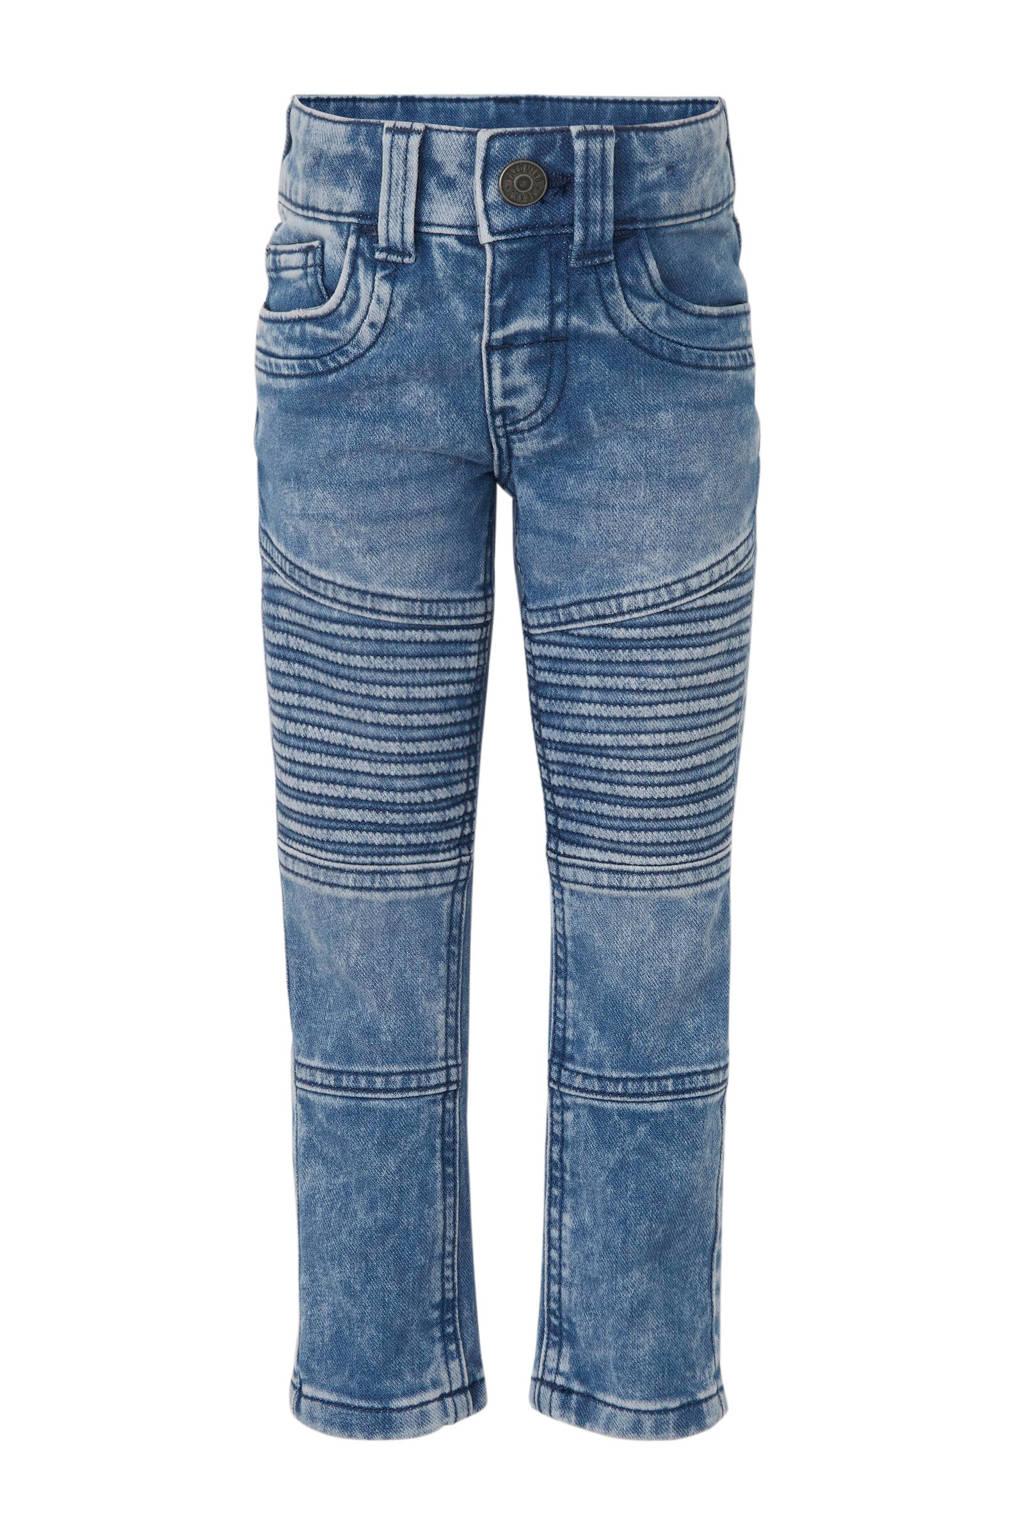 C&A Palomino jeans, Lichtblauw